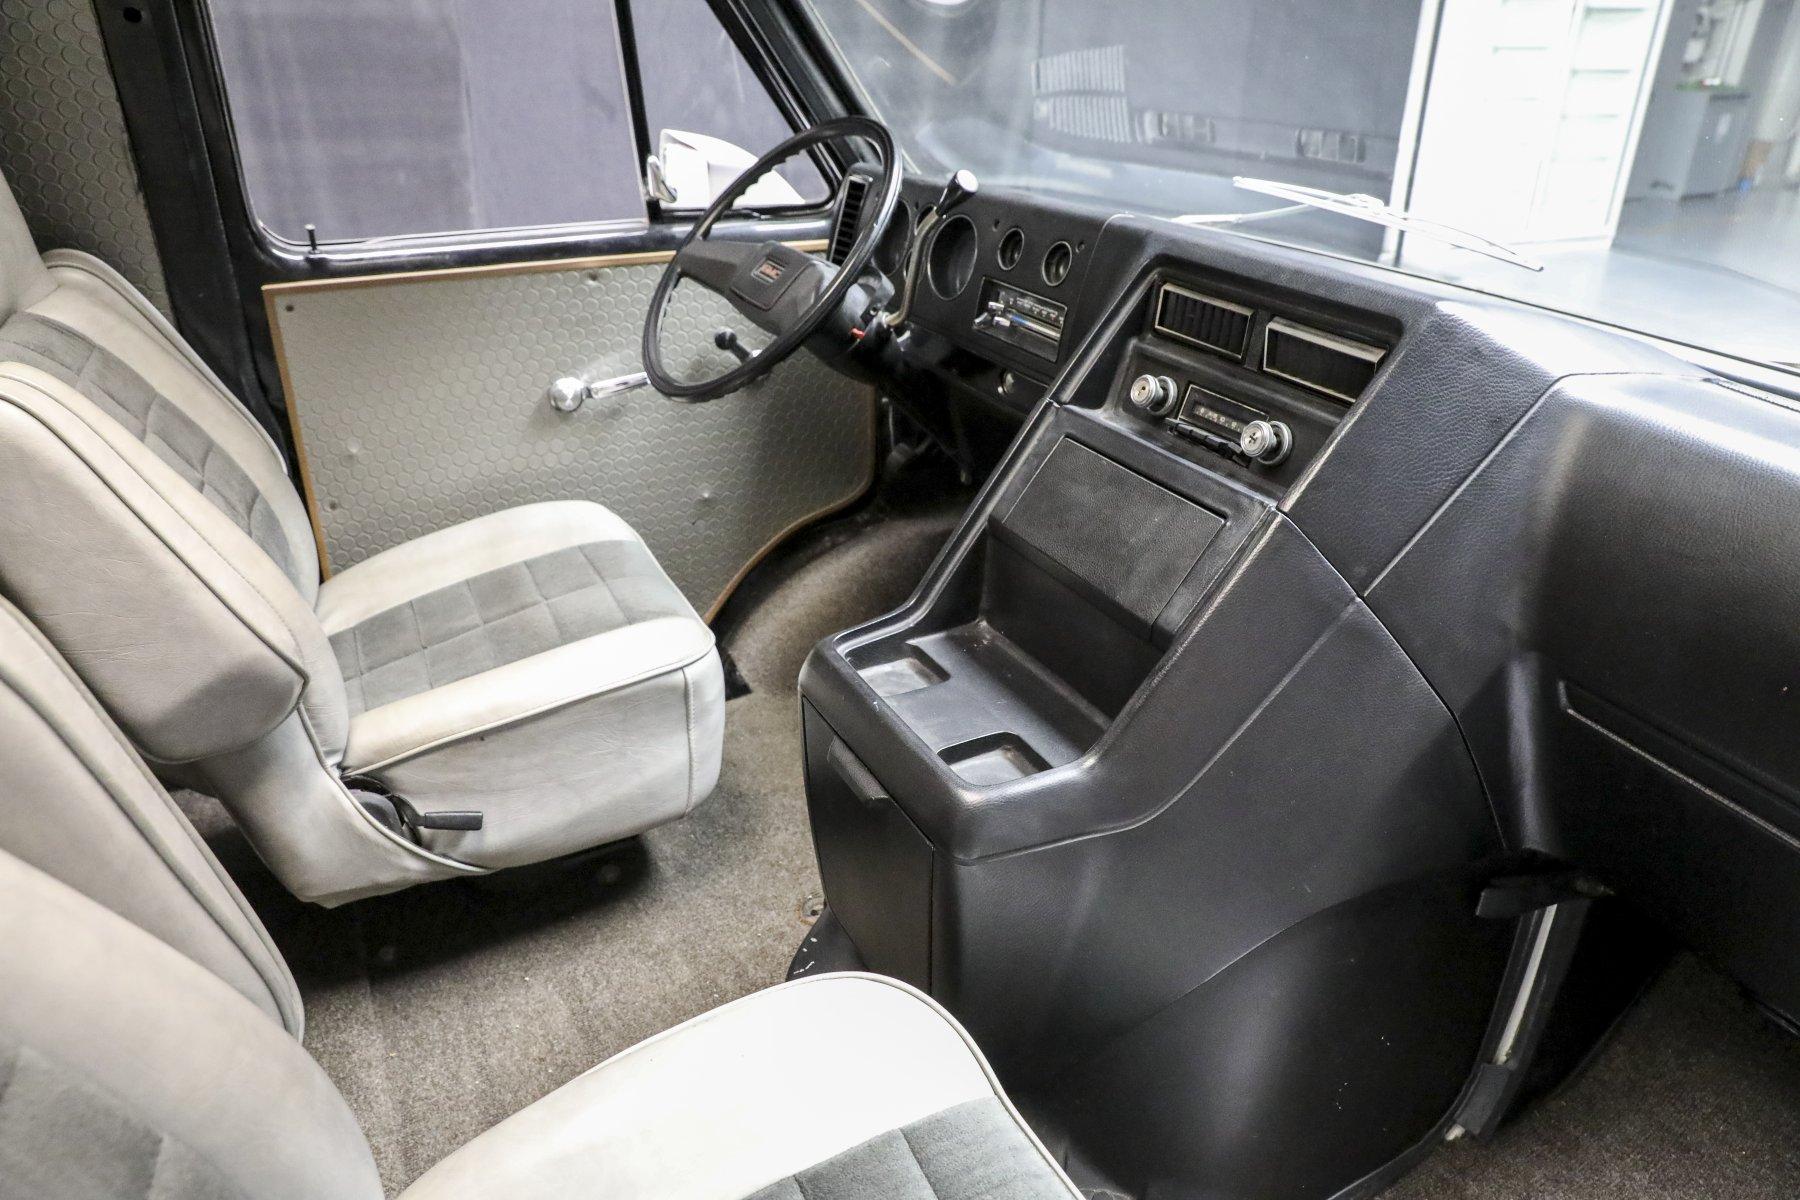 A-Team GMC G-Series 83 Van interior front